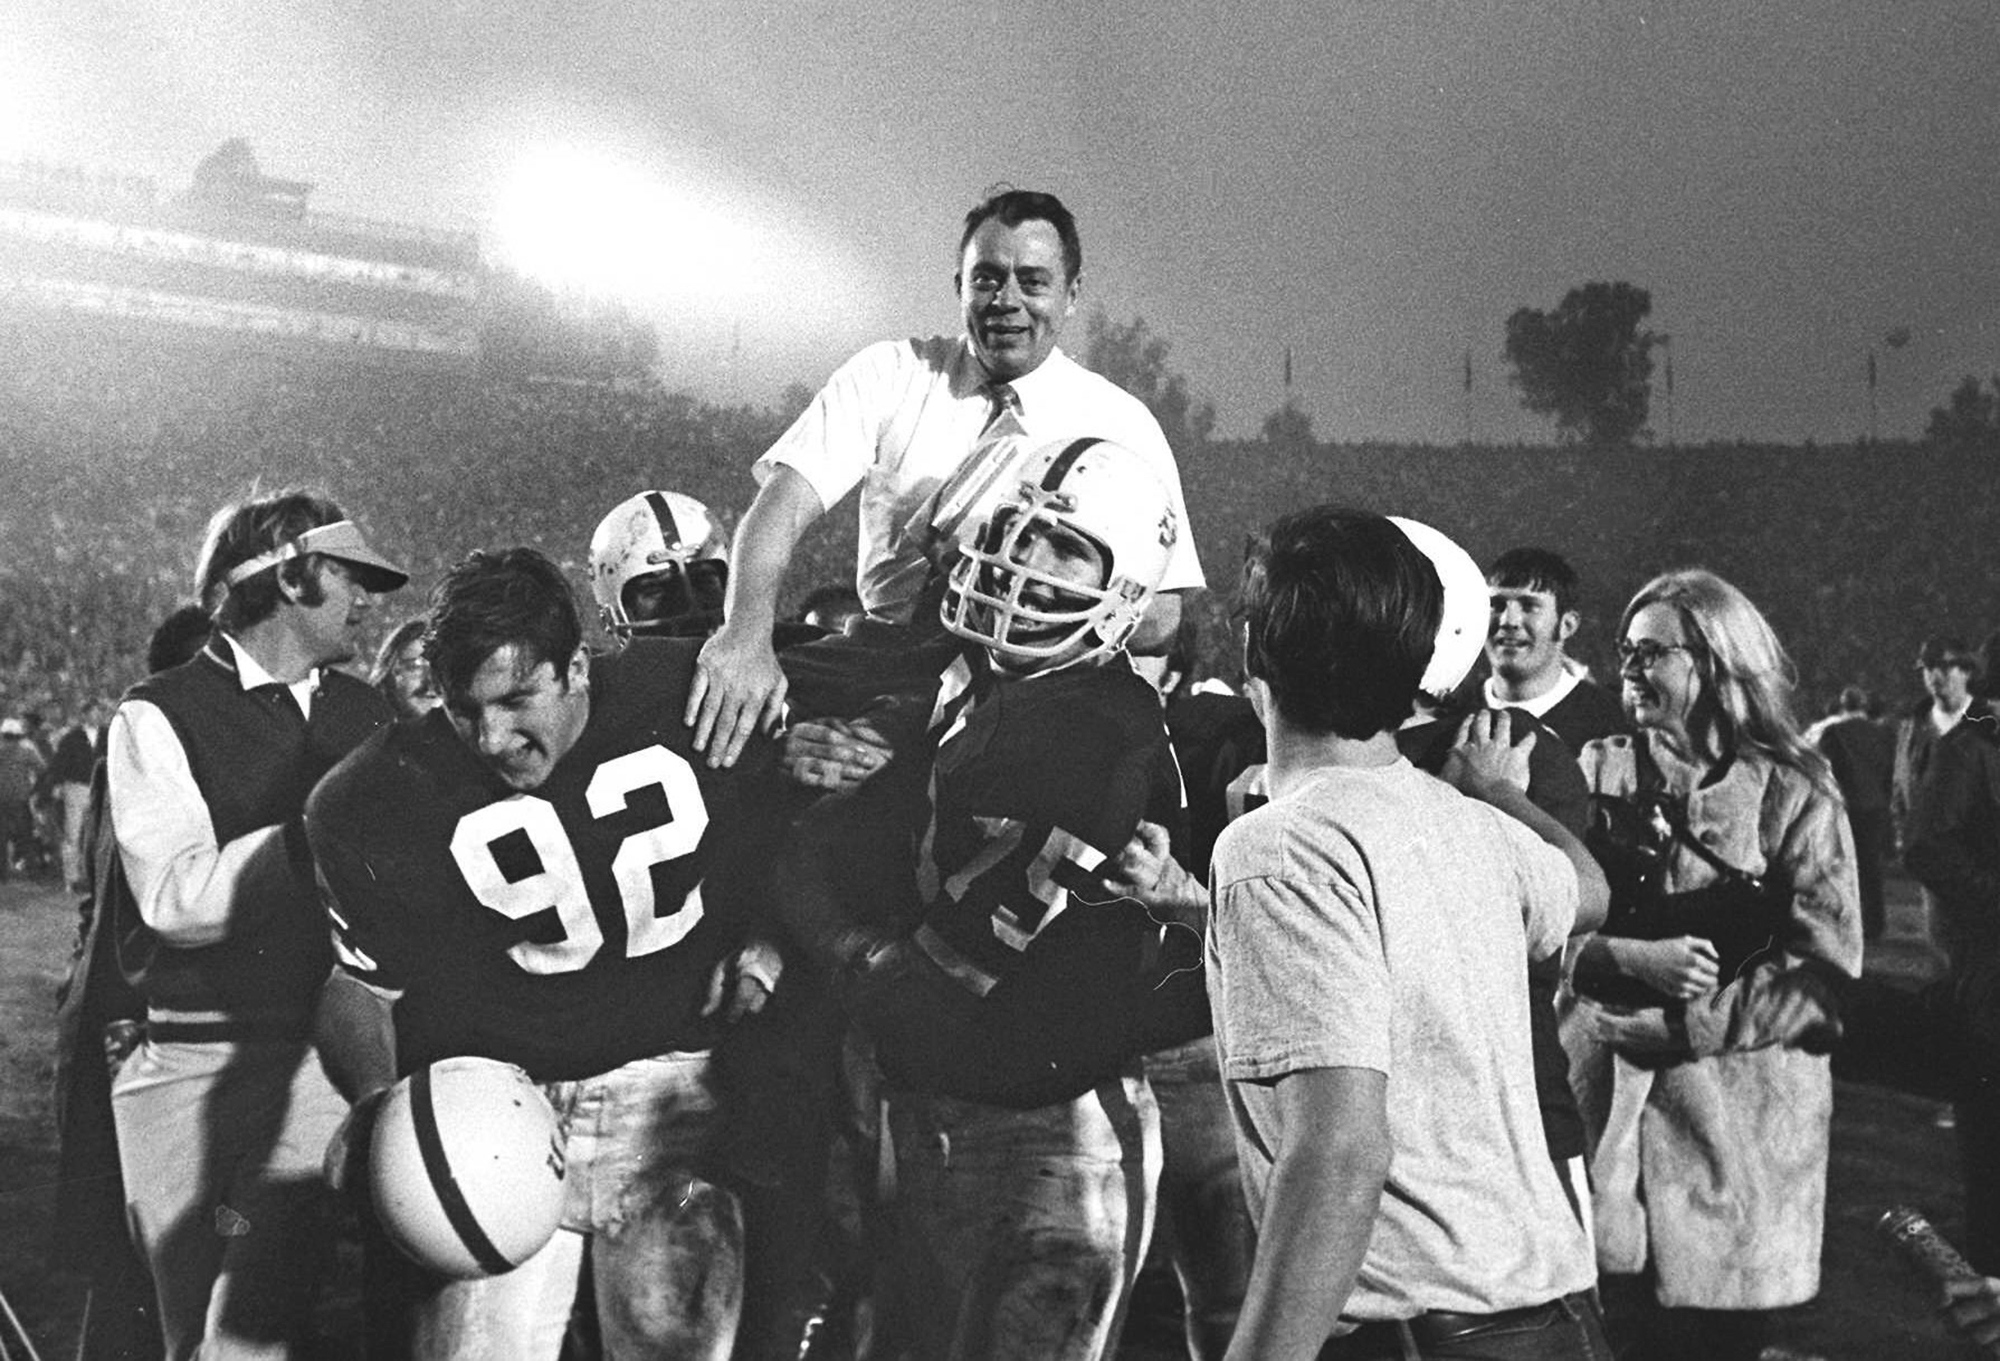 John Ralston, former Stanford, Broncos coach, dies at 92